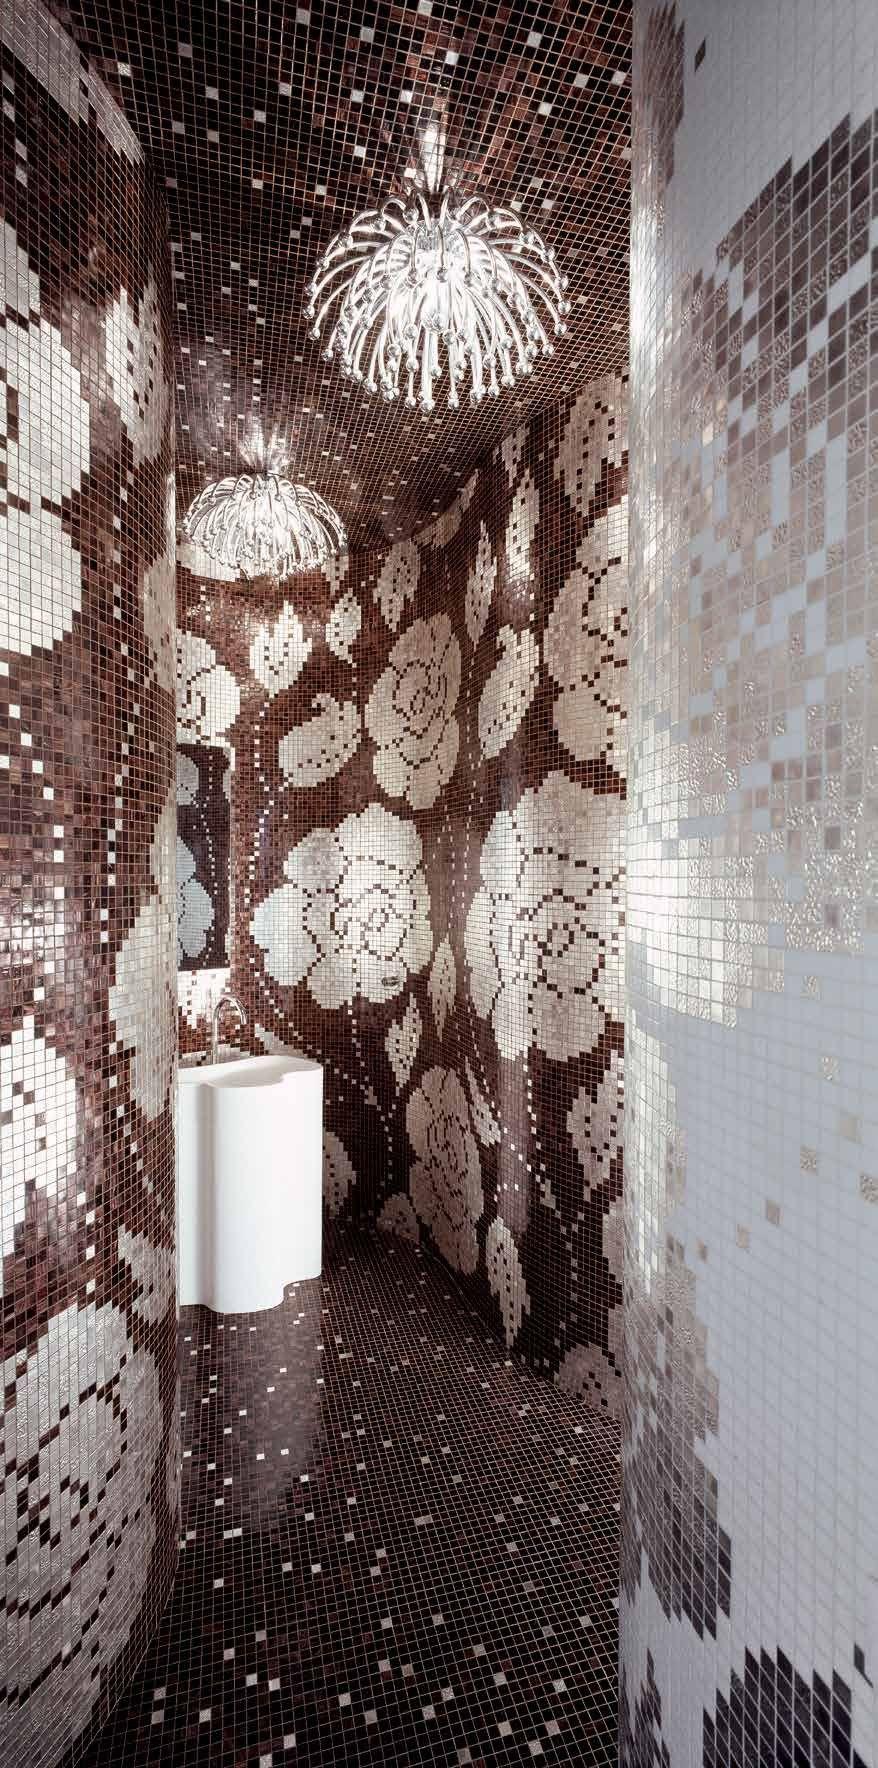 bisazza #decori 2x2 cm winter flowers oro nero | gold auf glass | im